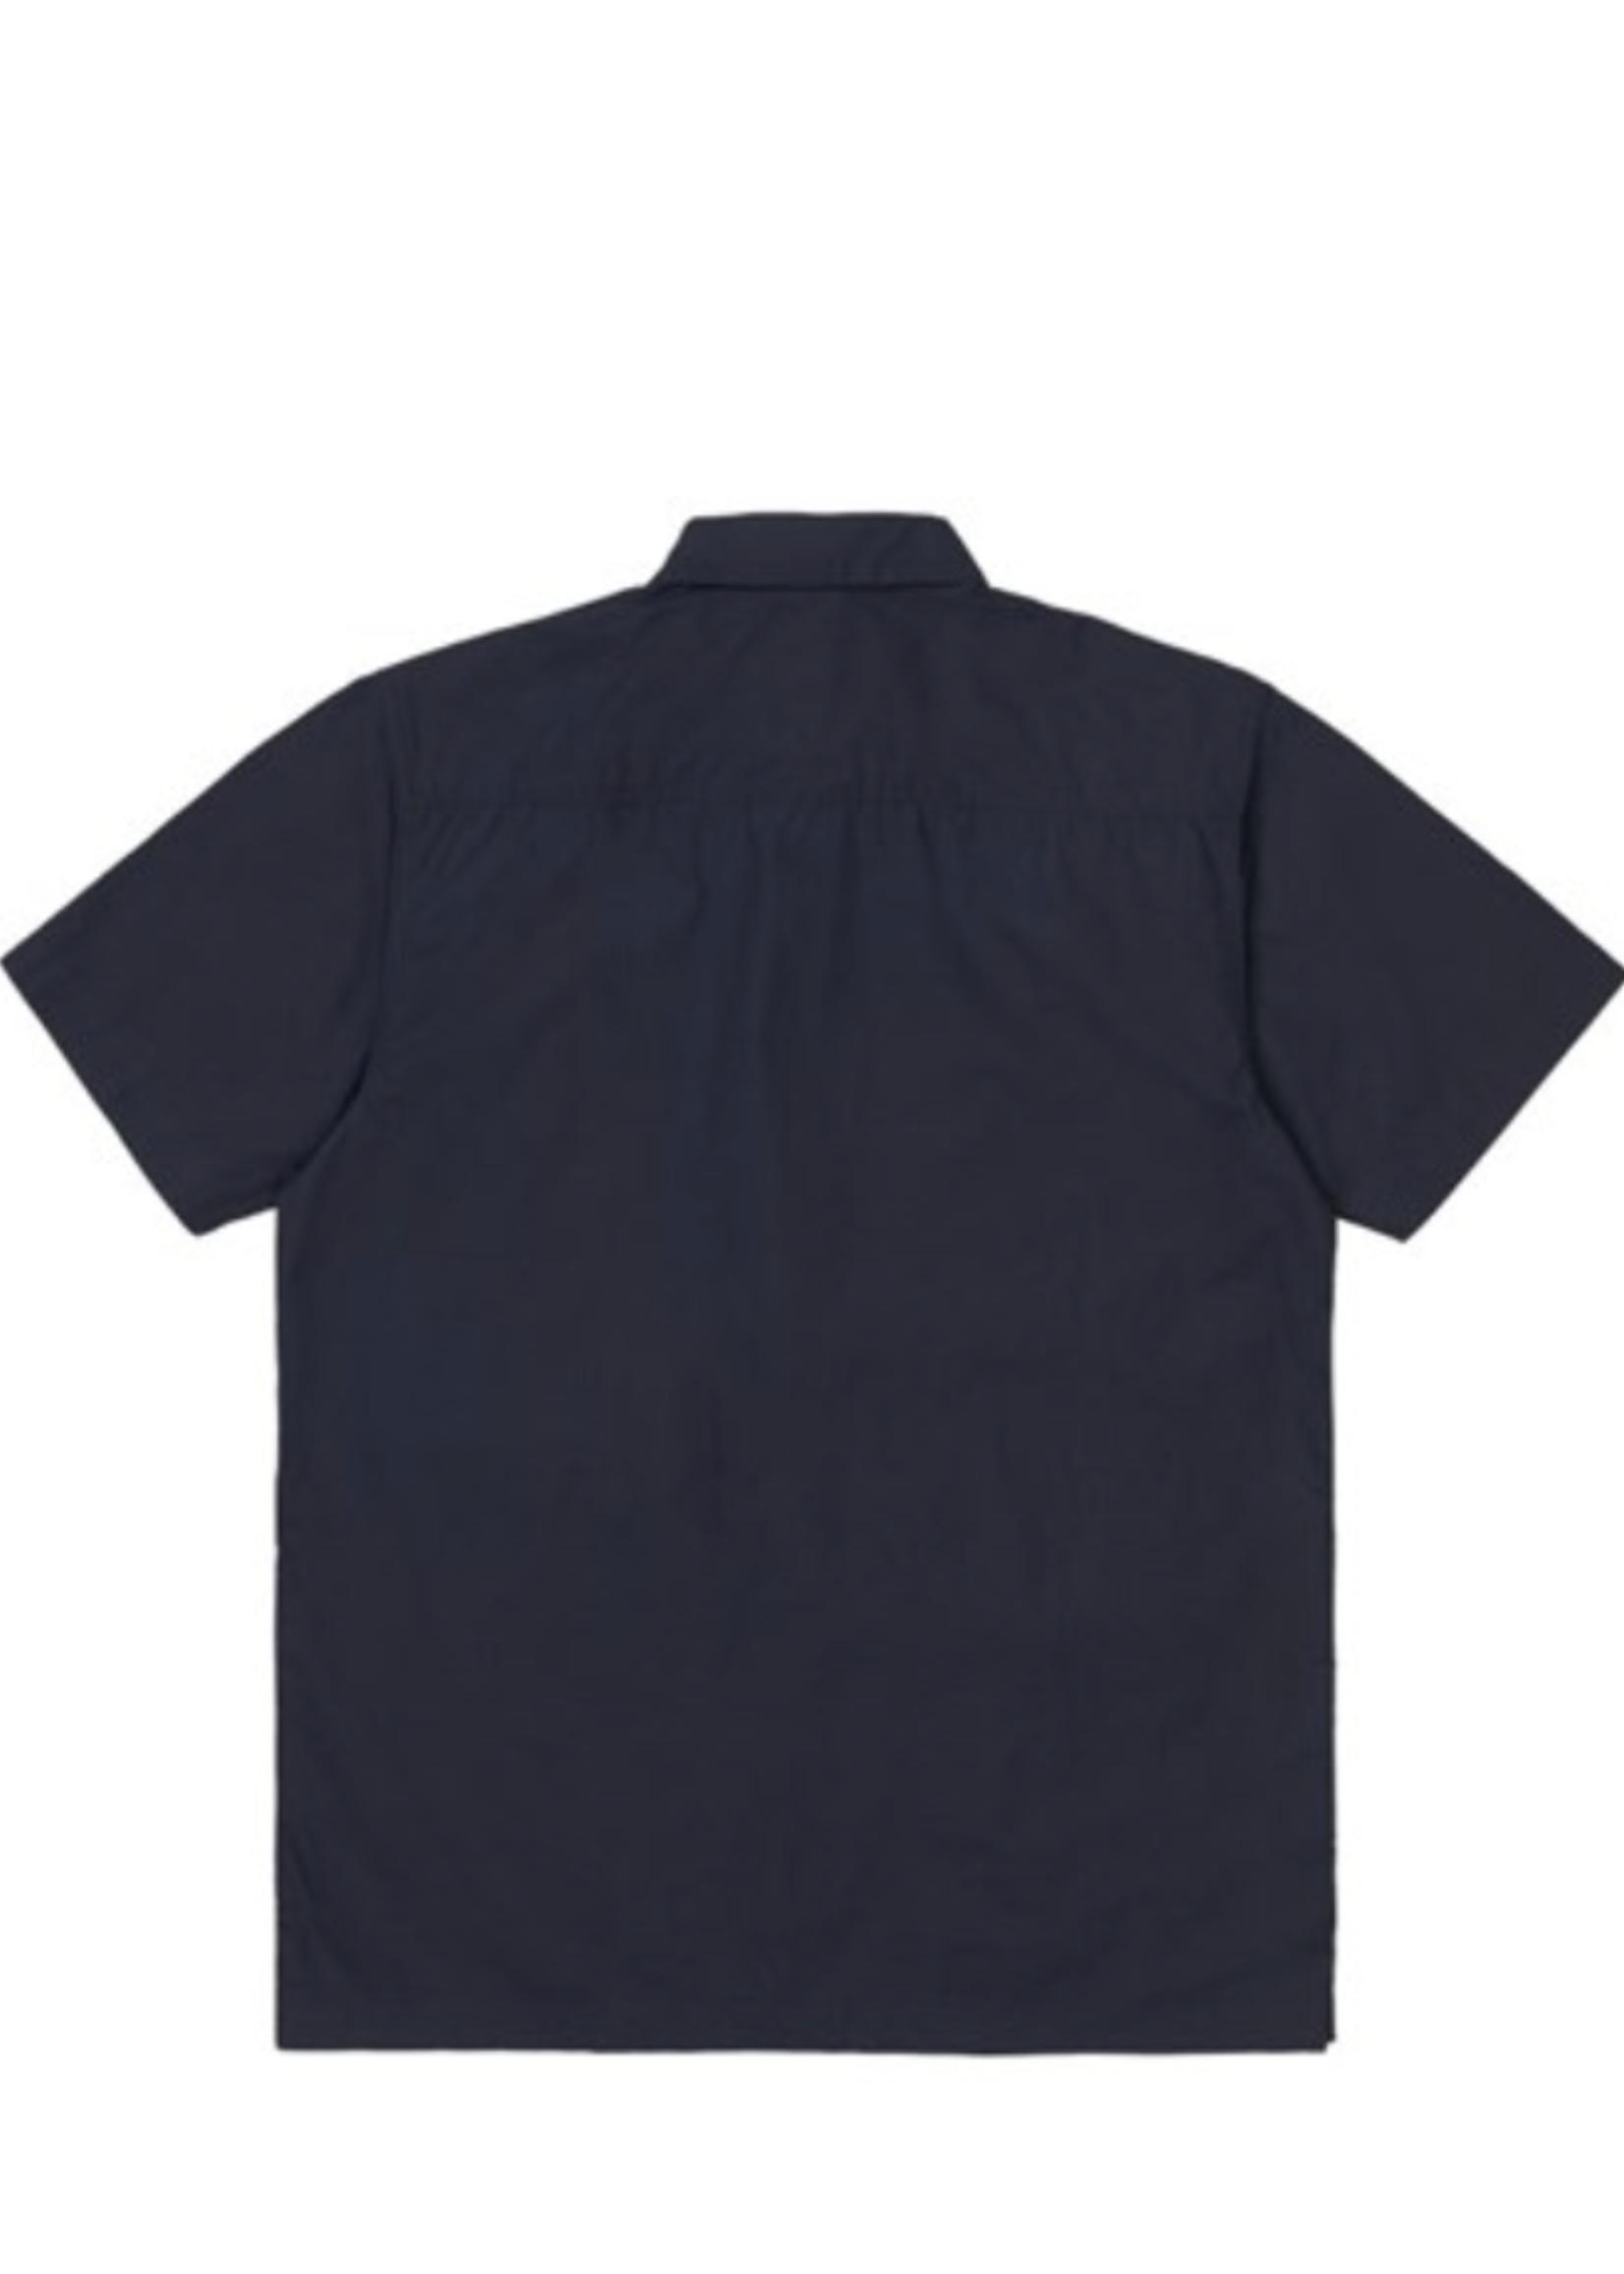 Carhartt Work In Progress Creek Multi-Pocket Shirt in Navy